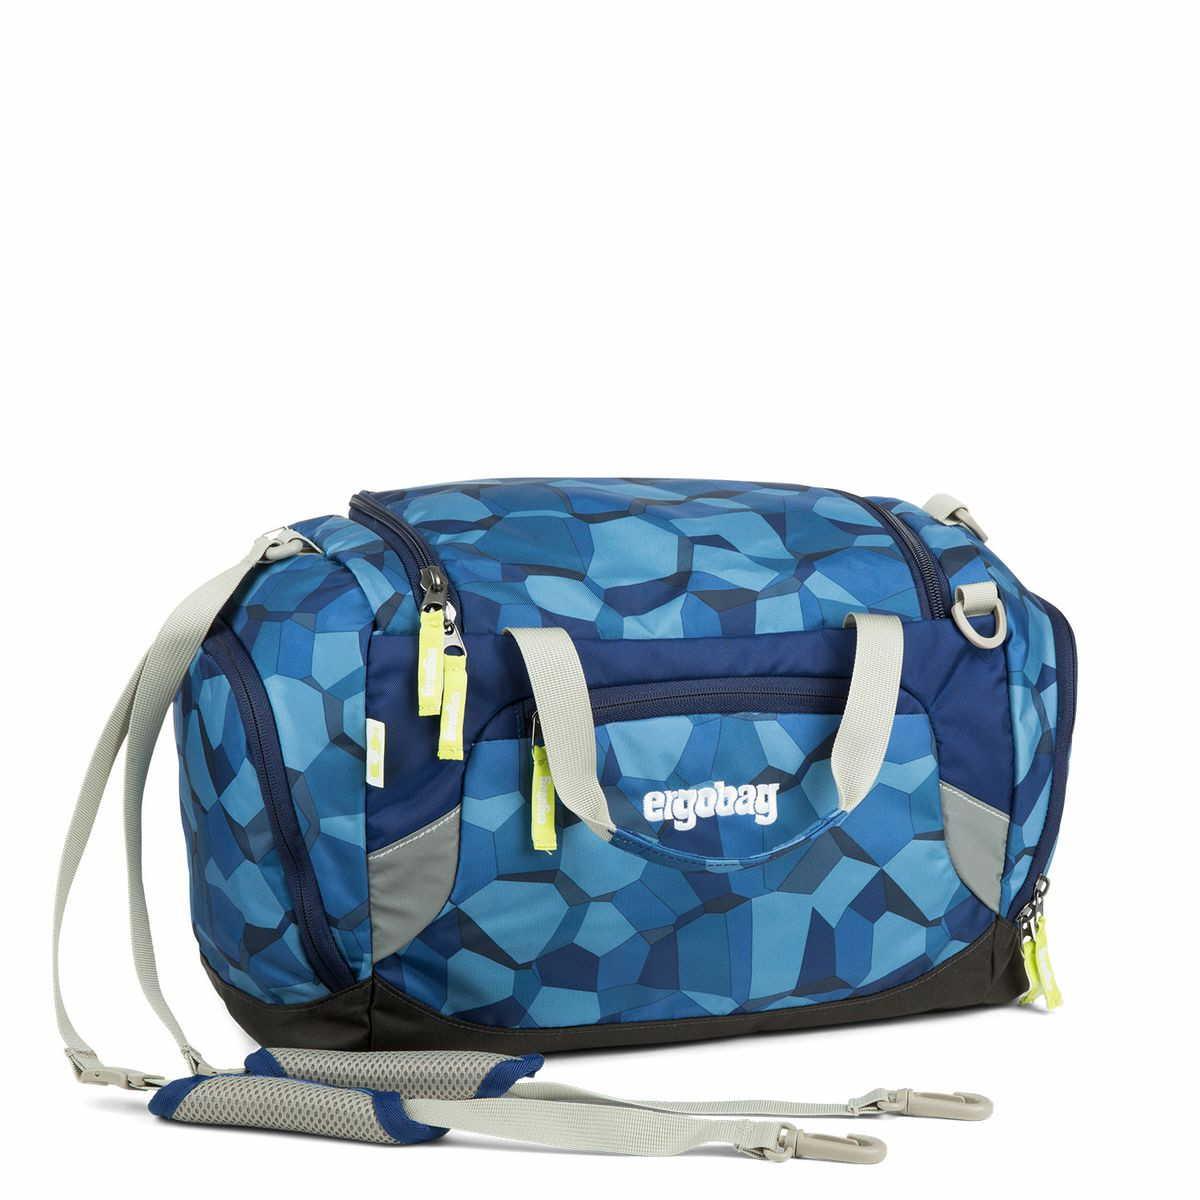 Ergobag Sporttasche blau